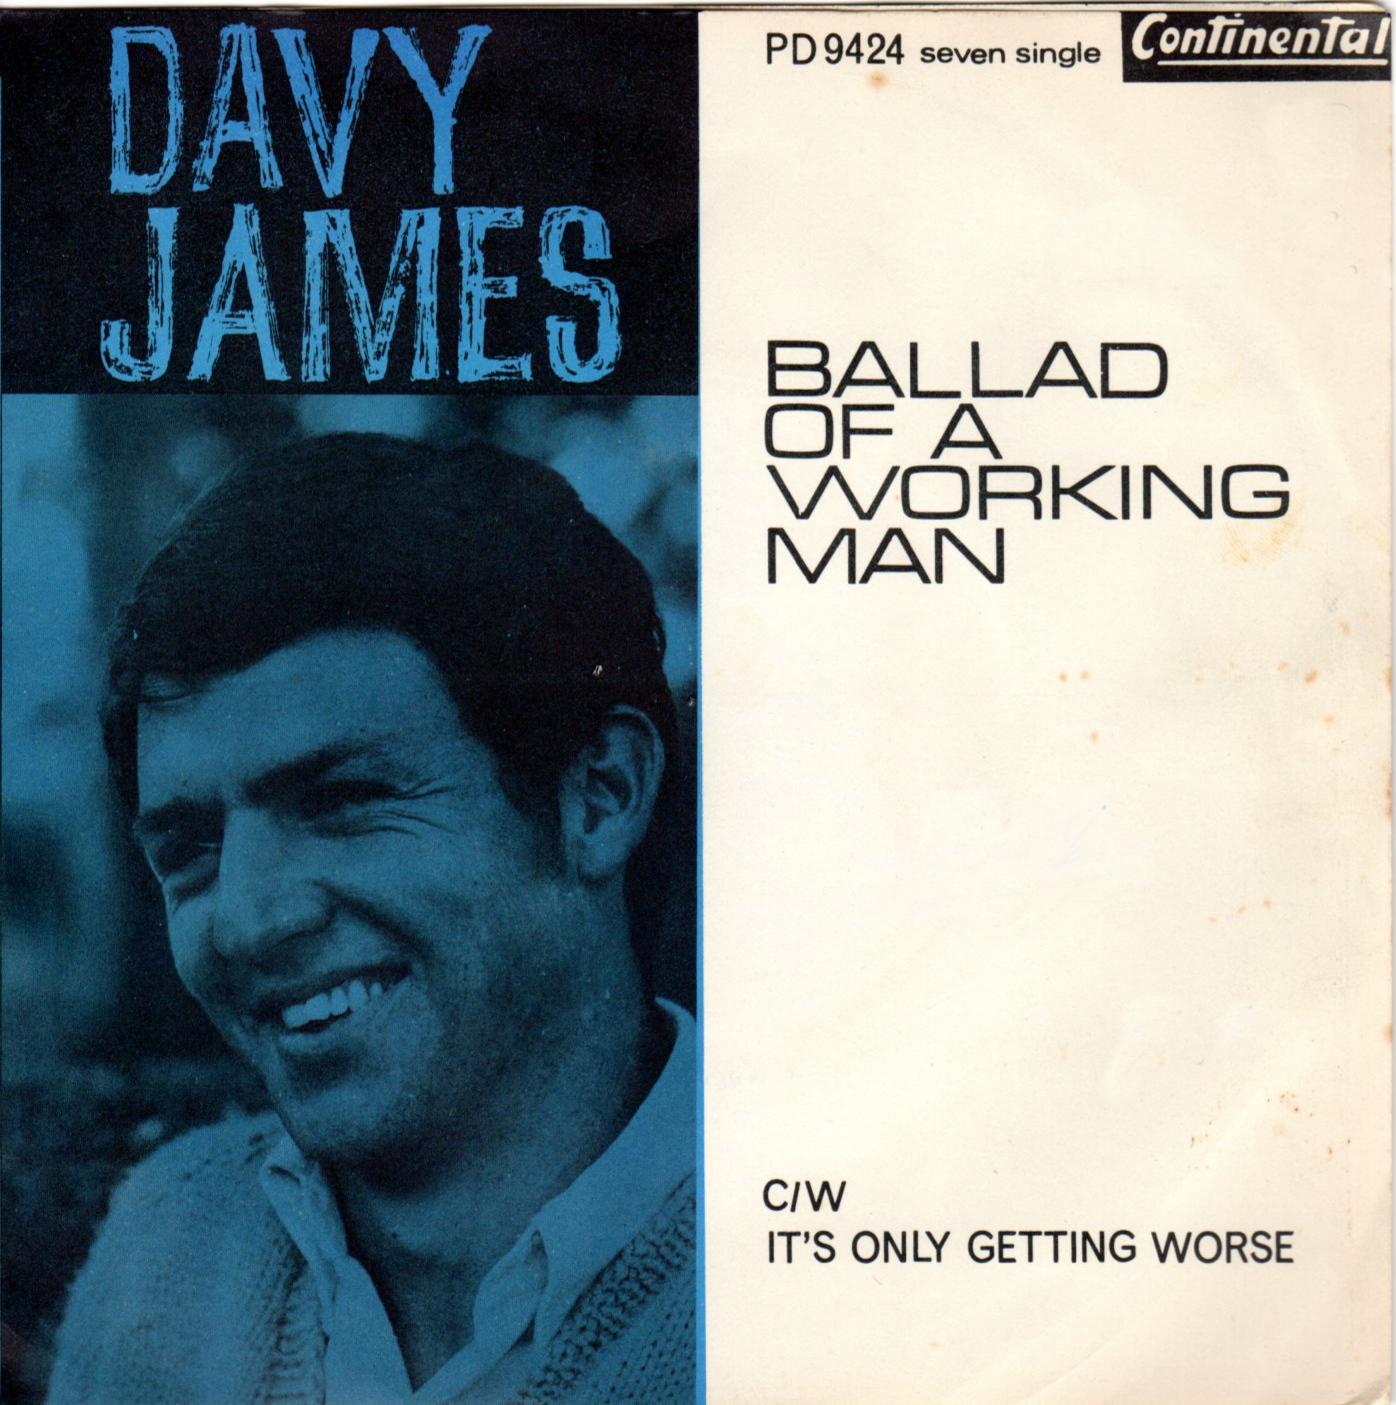 Ballad Of A Working Man – Davy James